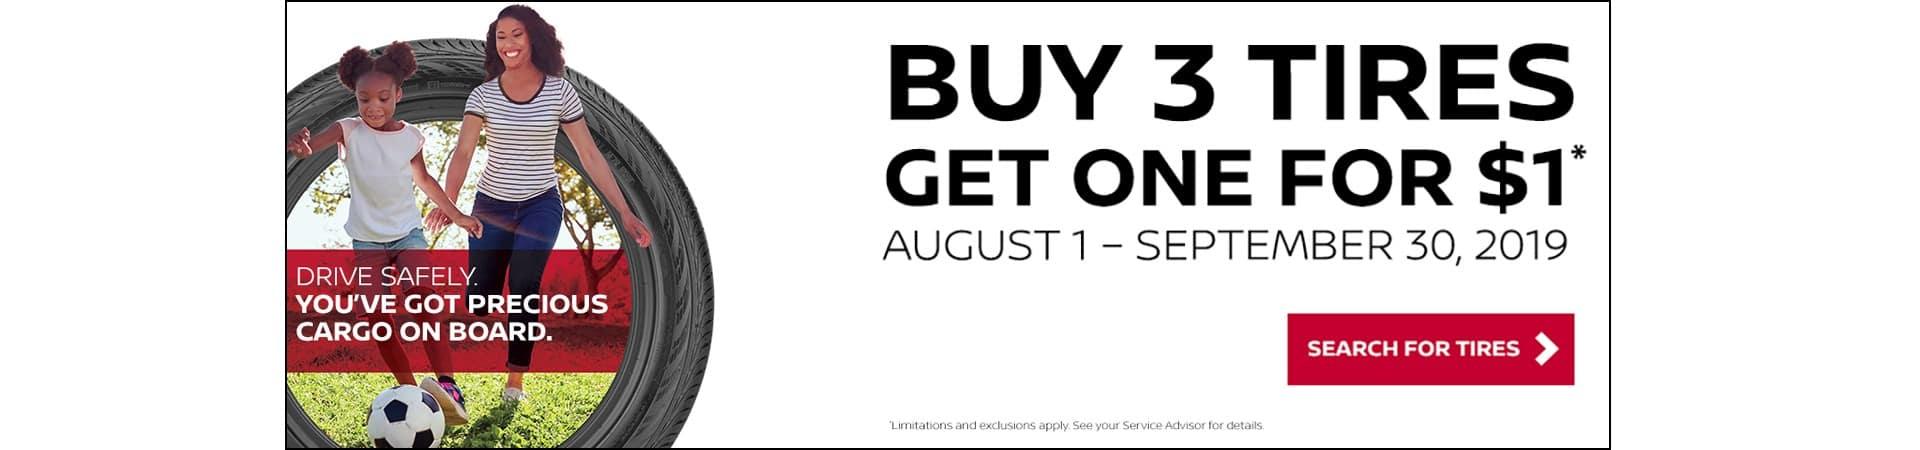 Nissan Tires Sale August 2019